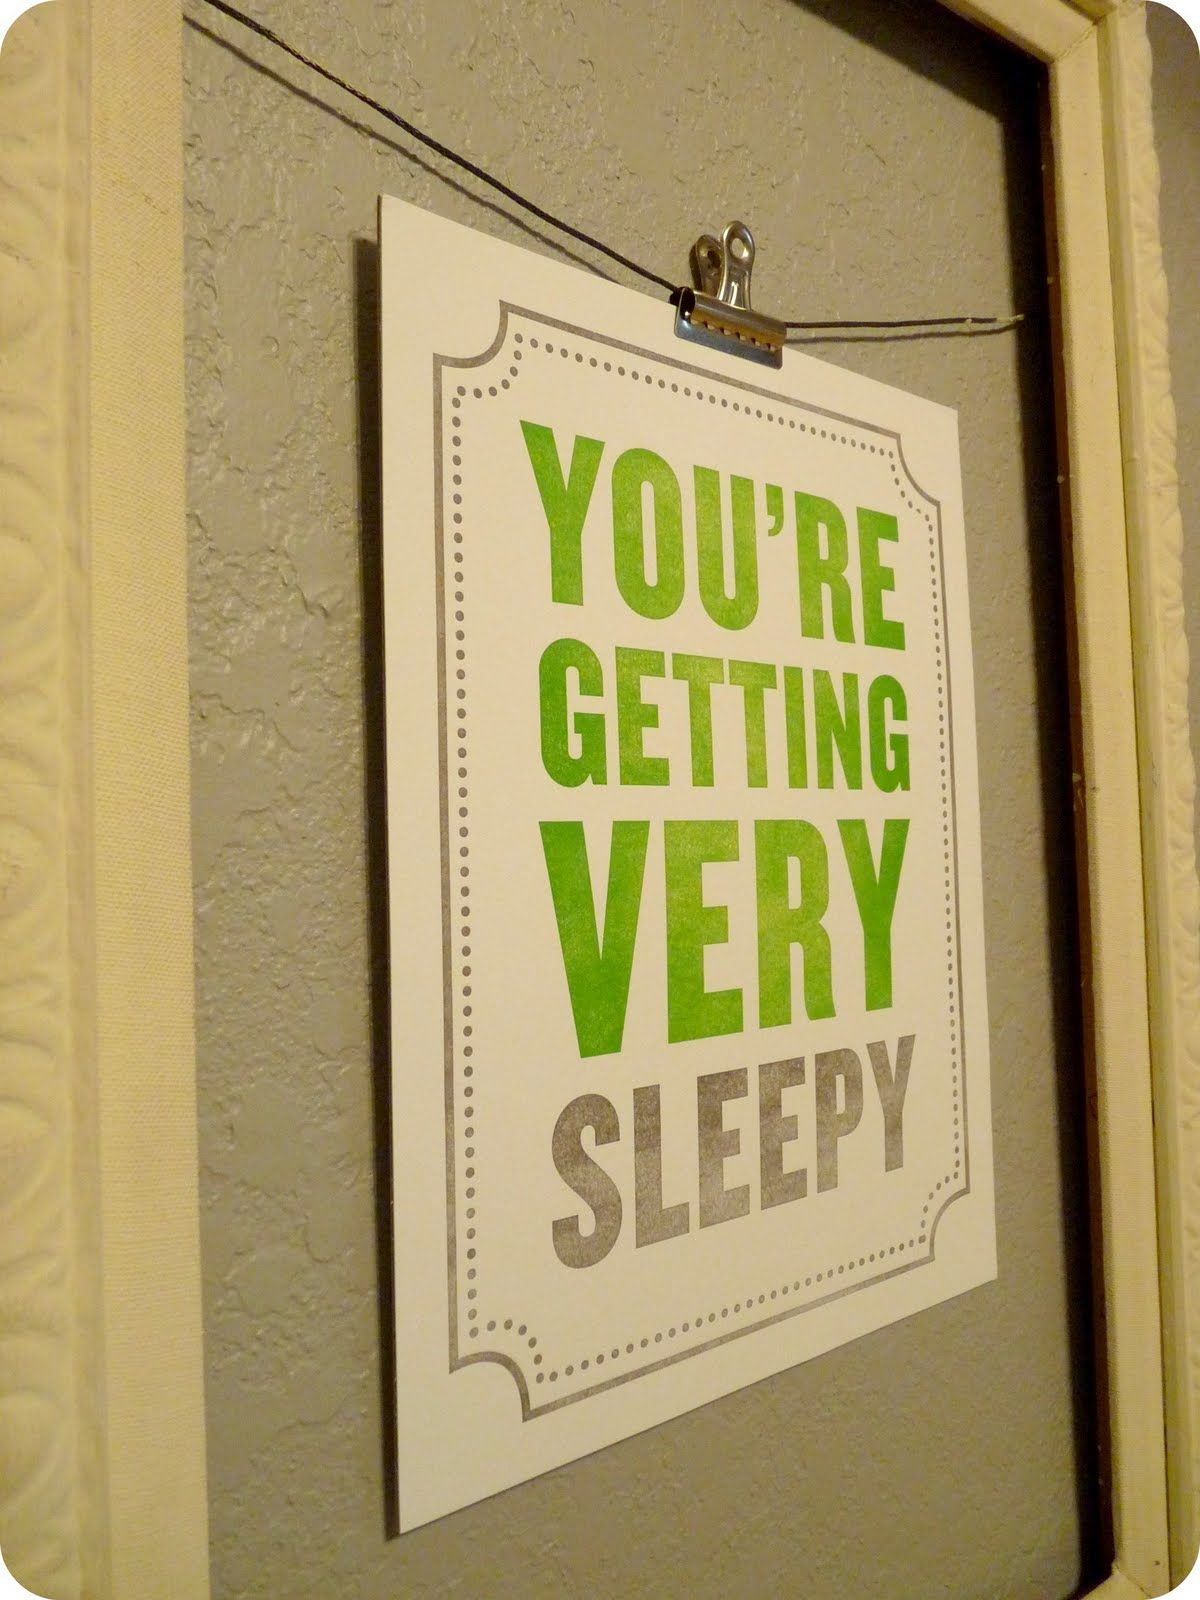 cool print/framing idea | boys bedrooms | Pinterest | Wall ideas ...